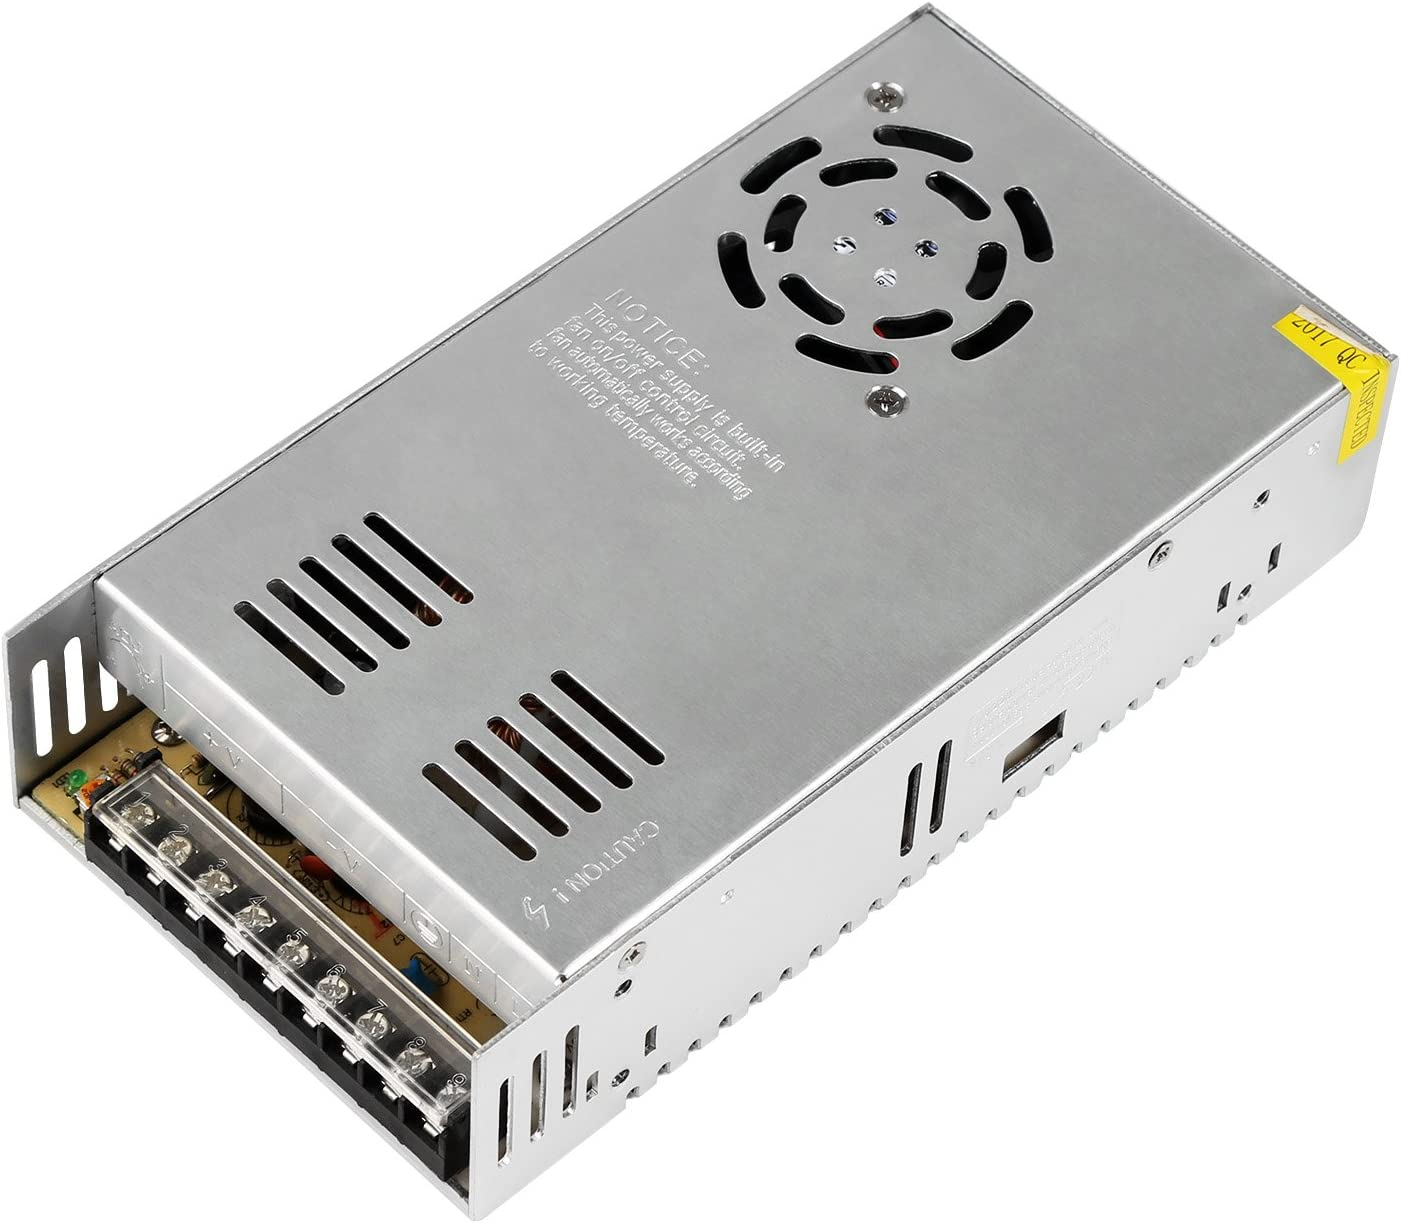 NEWSTYLE Fuente Alimentacion Transformador Interruptor DC 12V 30A 360W para CCTV, Radio, Proyecto de Computadora (24V 15A)